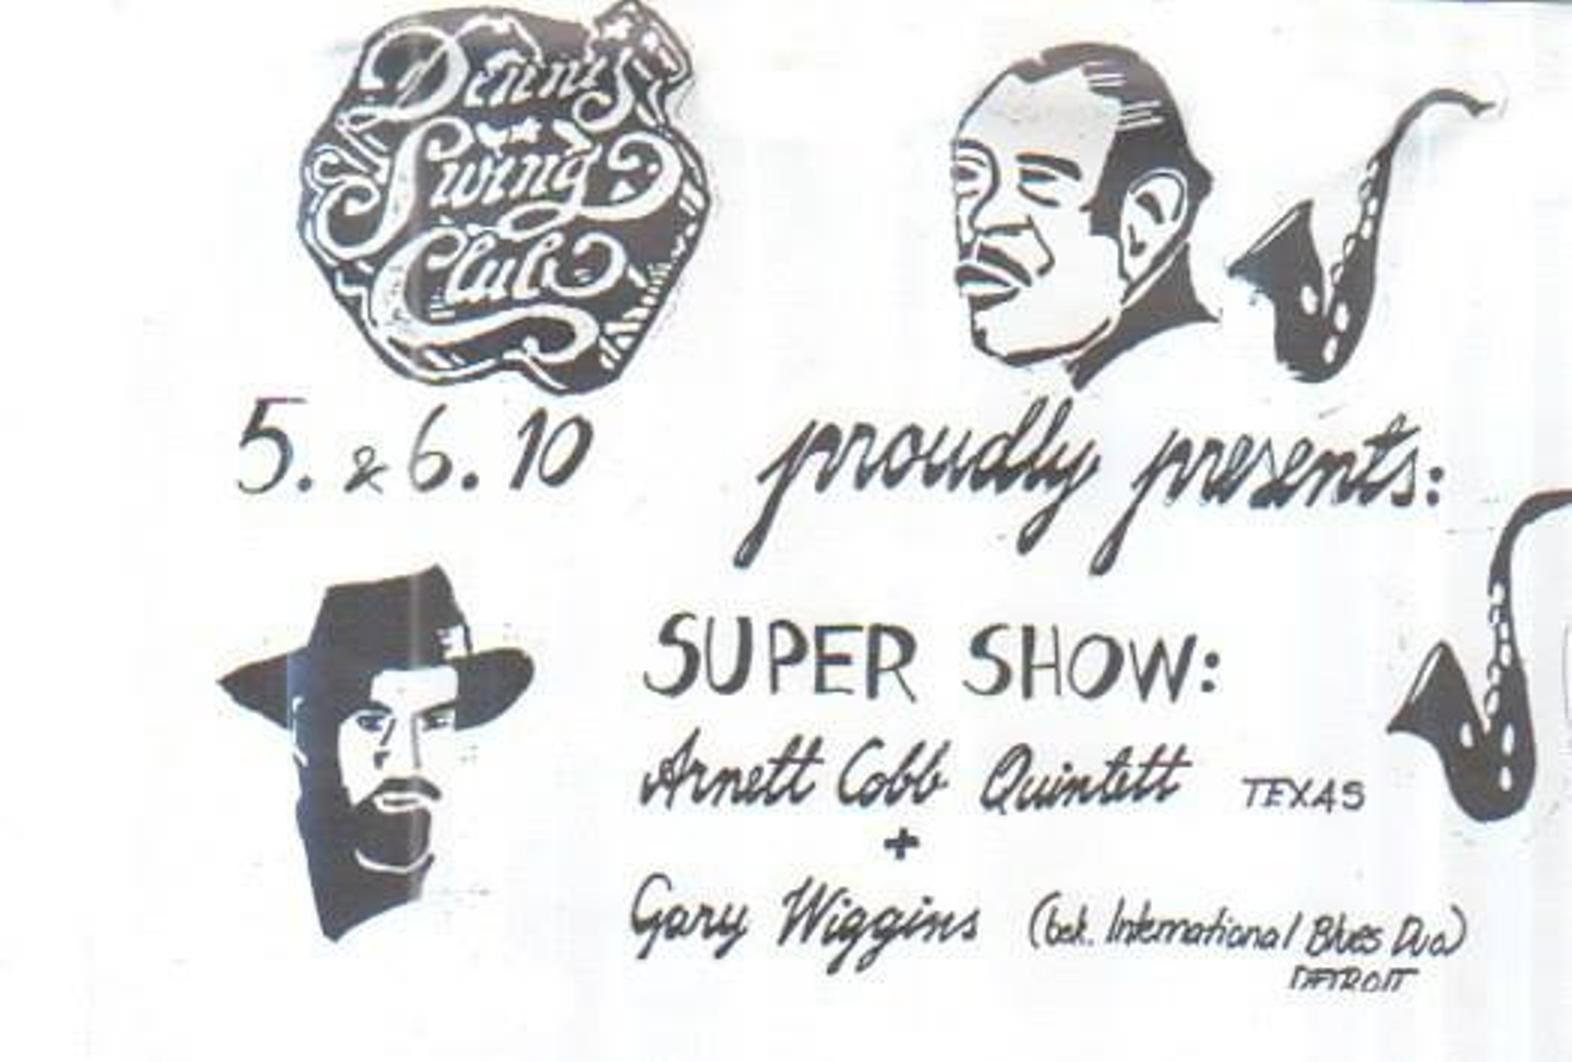 Concert in Hamburg, Germany